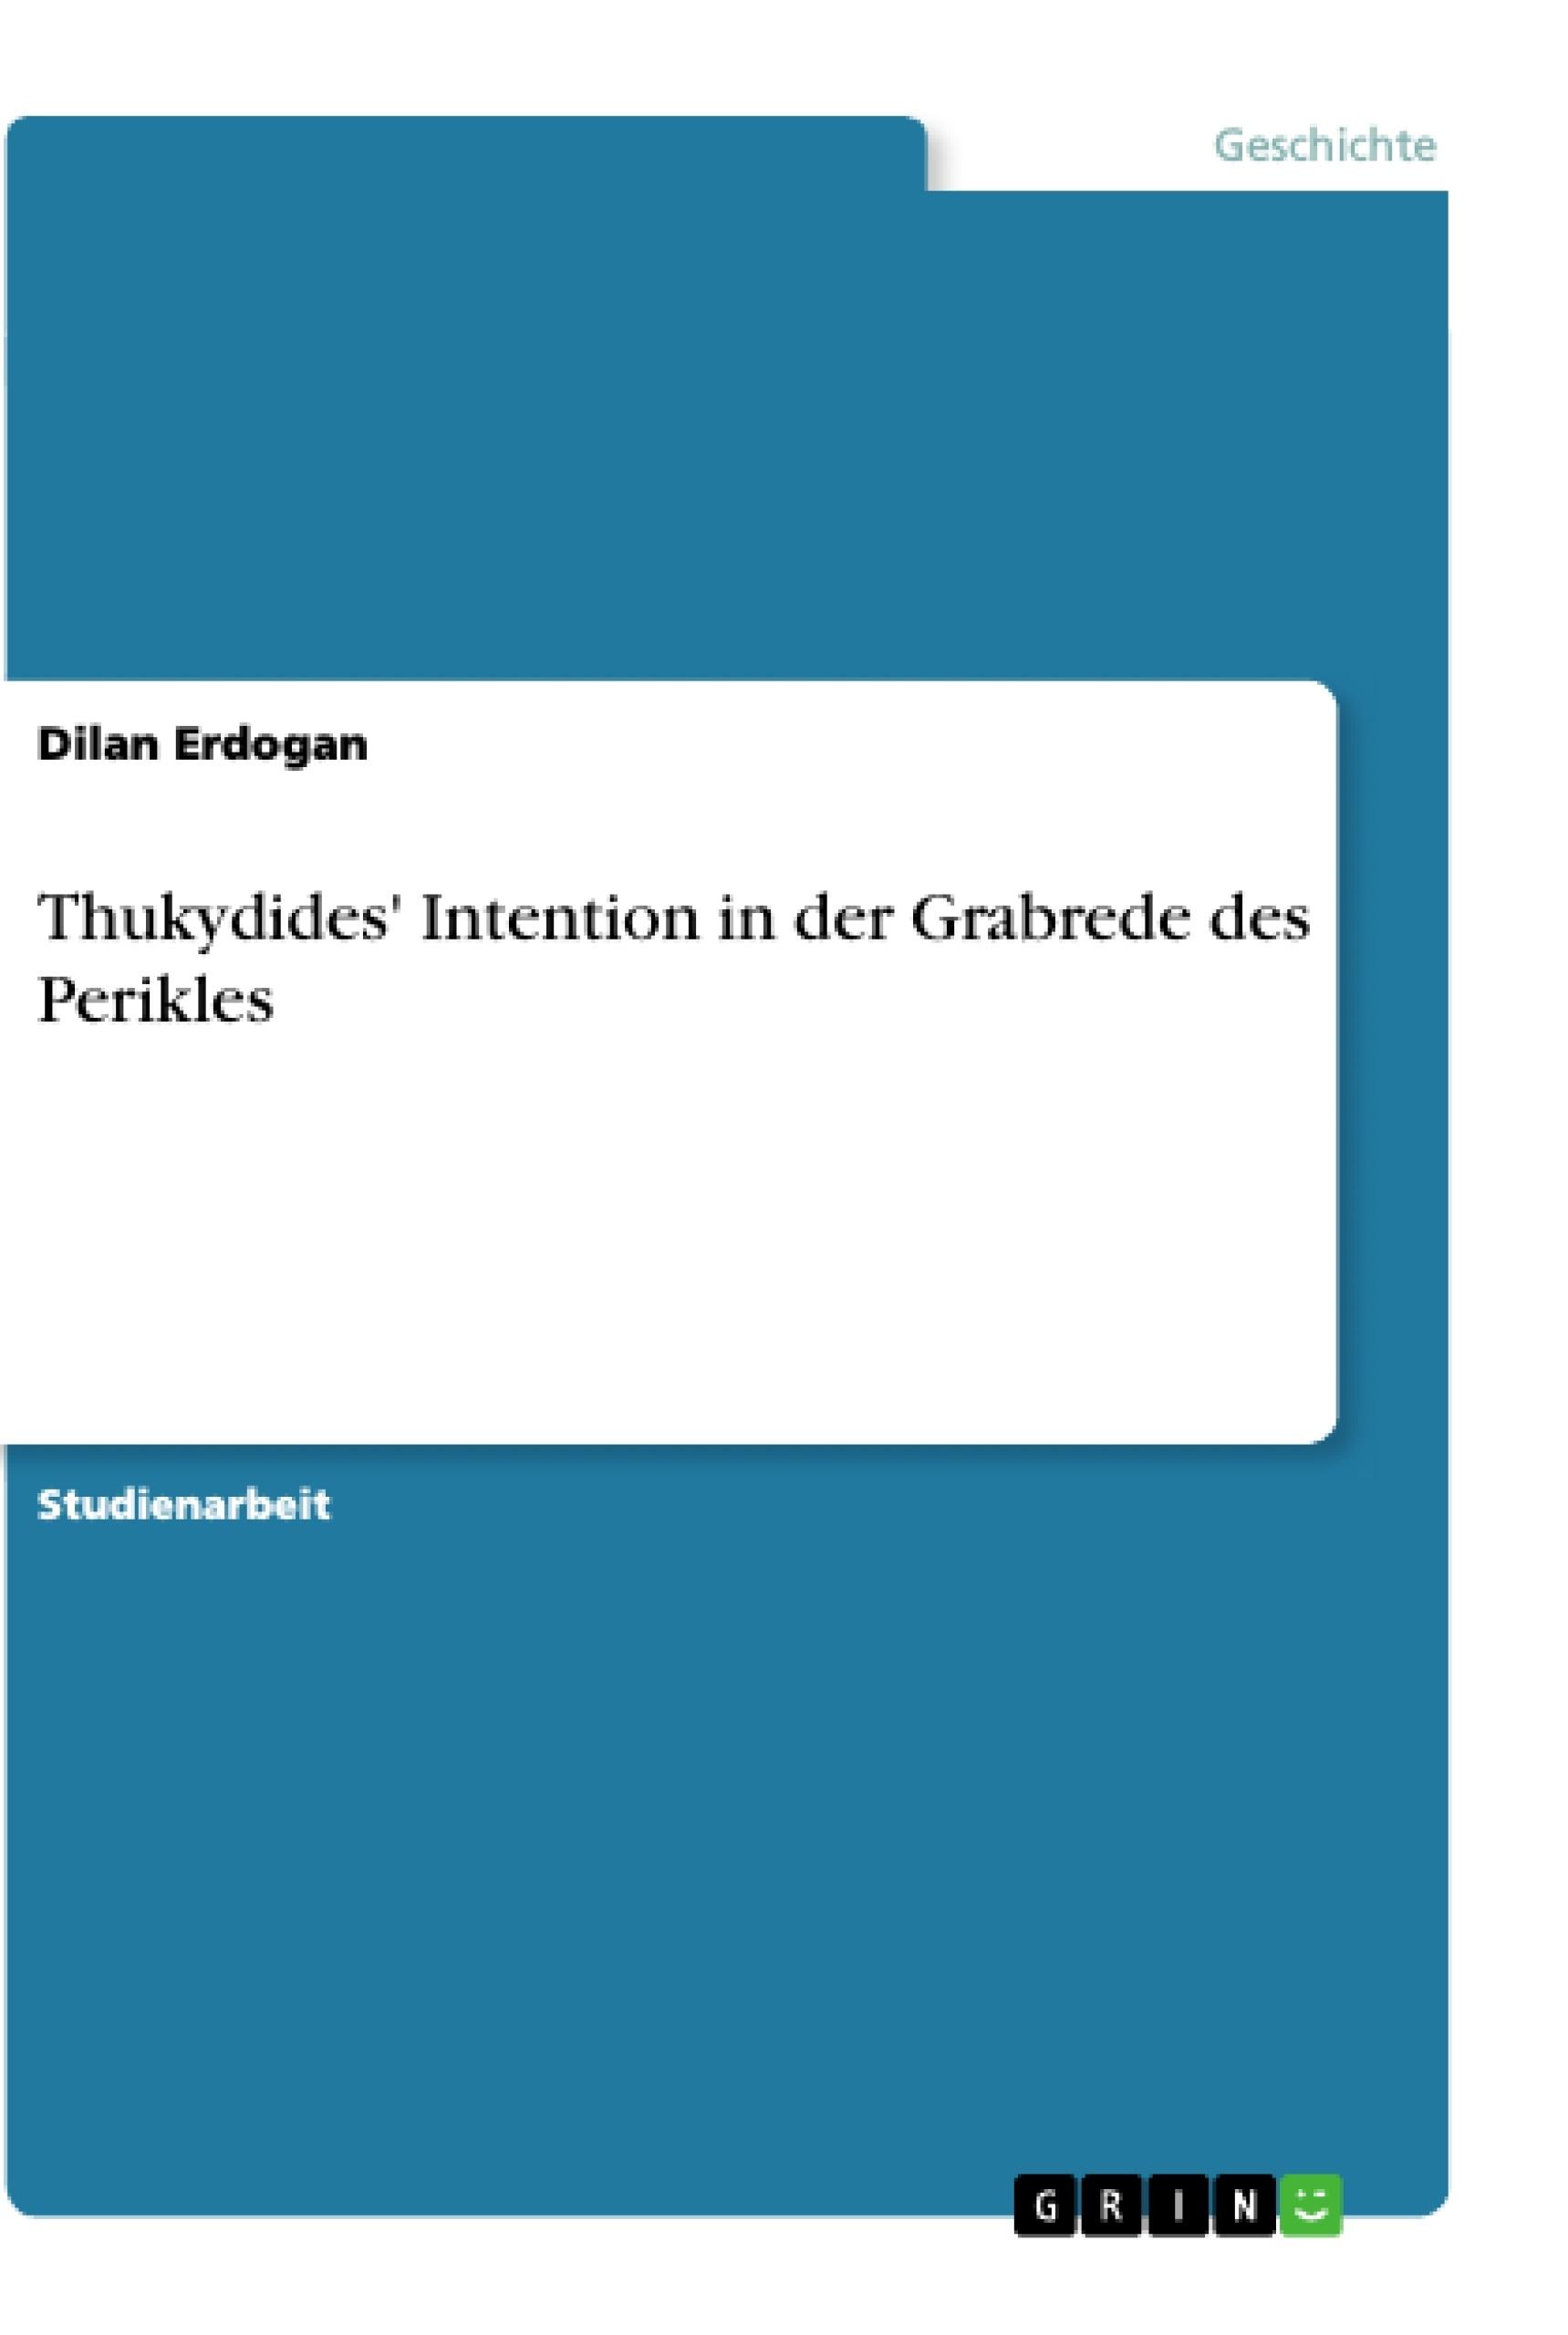 Titel: Thukydides' Intention in der Grabrede des Perikles